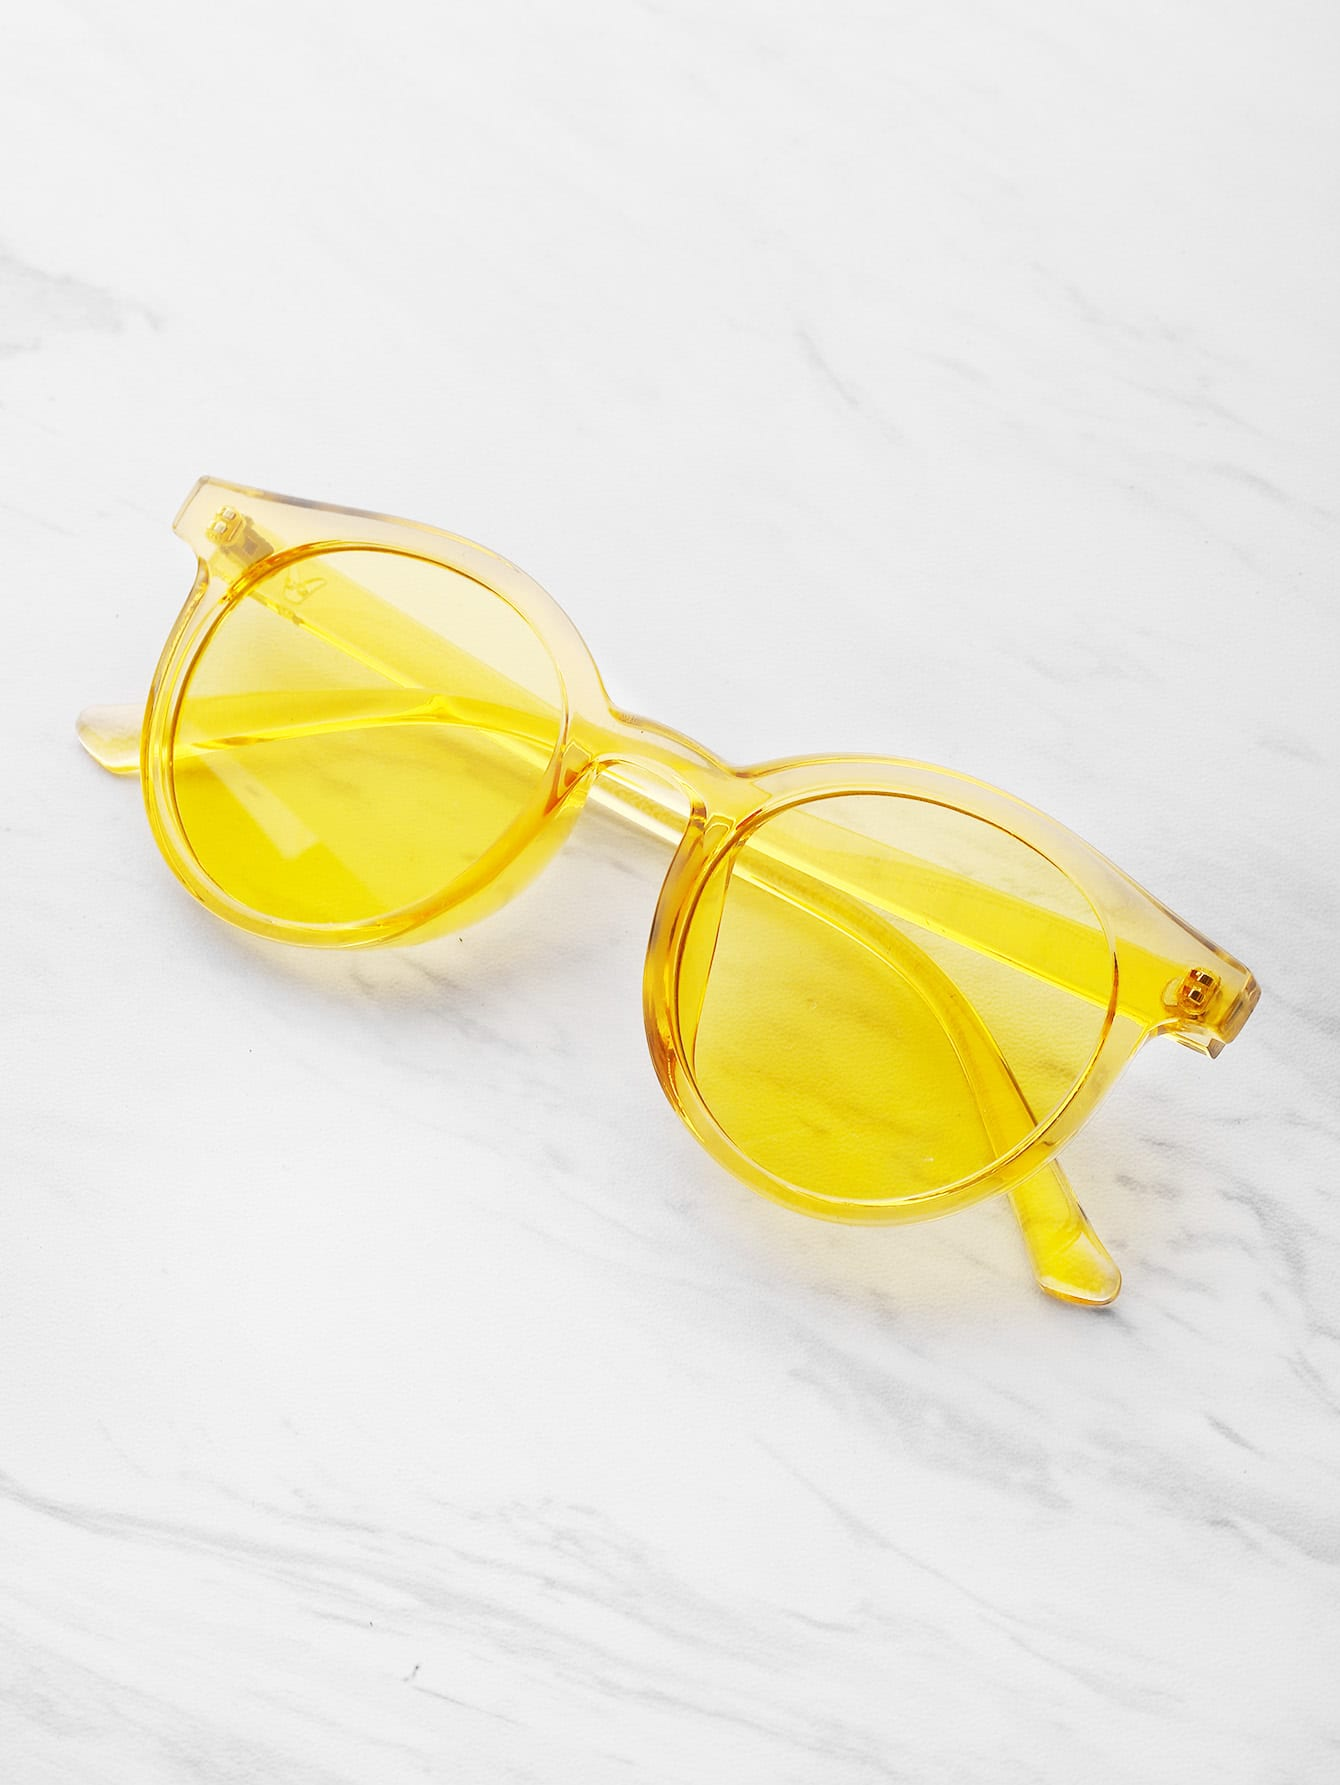 transparent frame sunglasses sunglass170413301_1 sunglass170413301_1 sunglass170413301_2 sunglass170413301_2